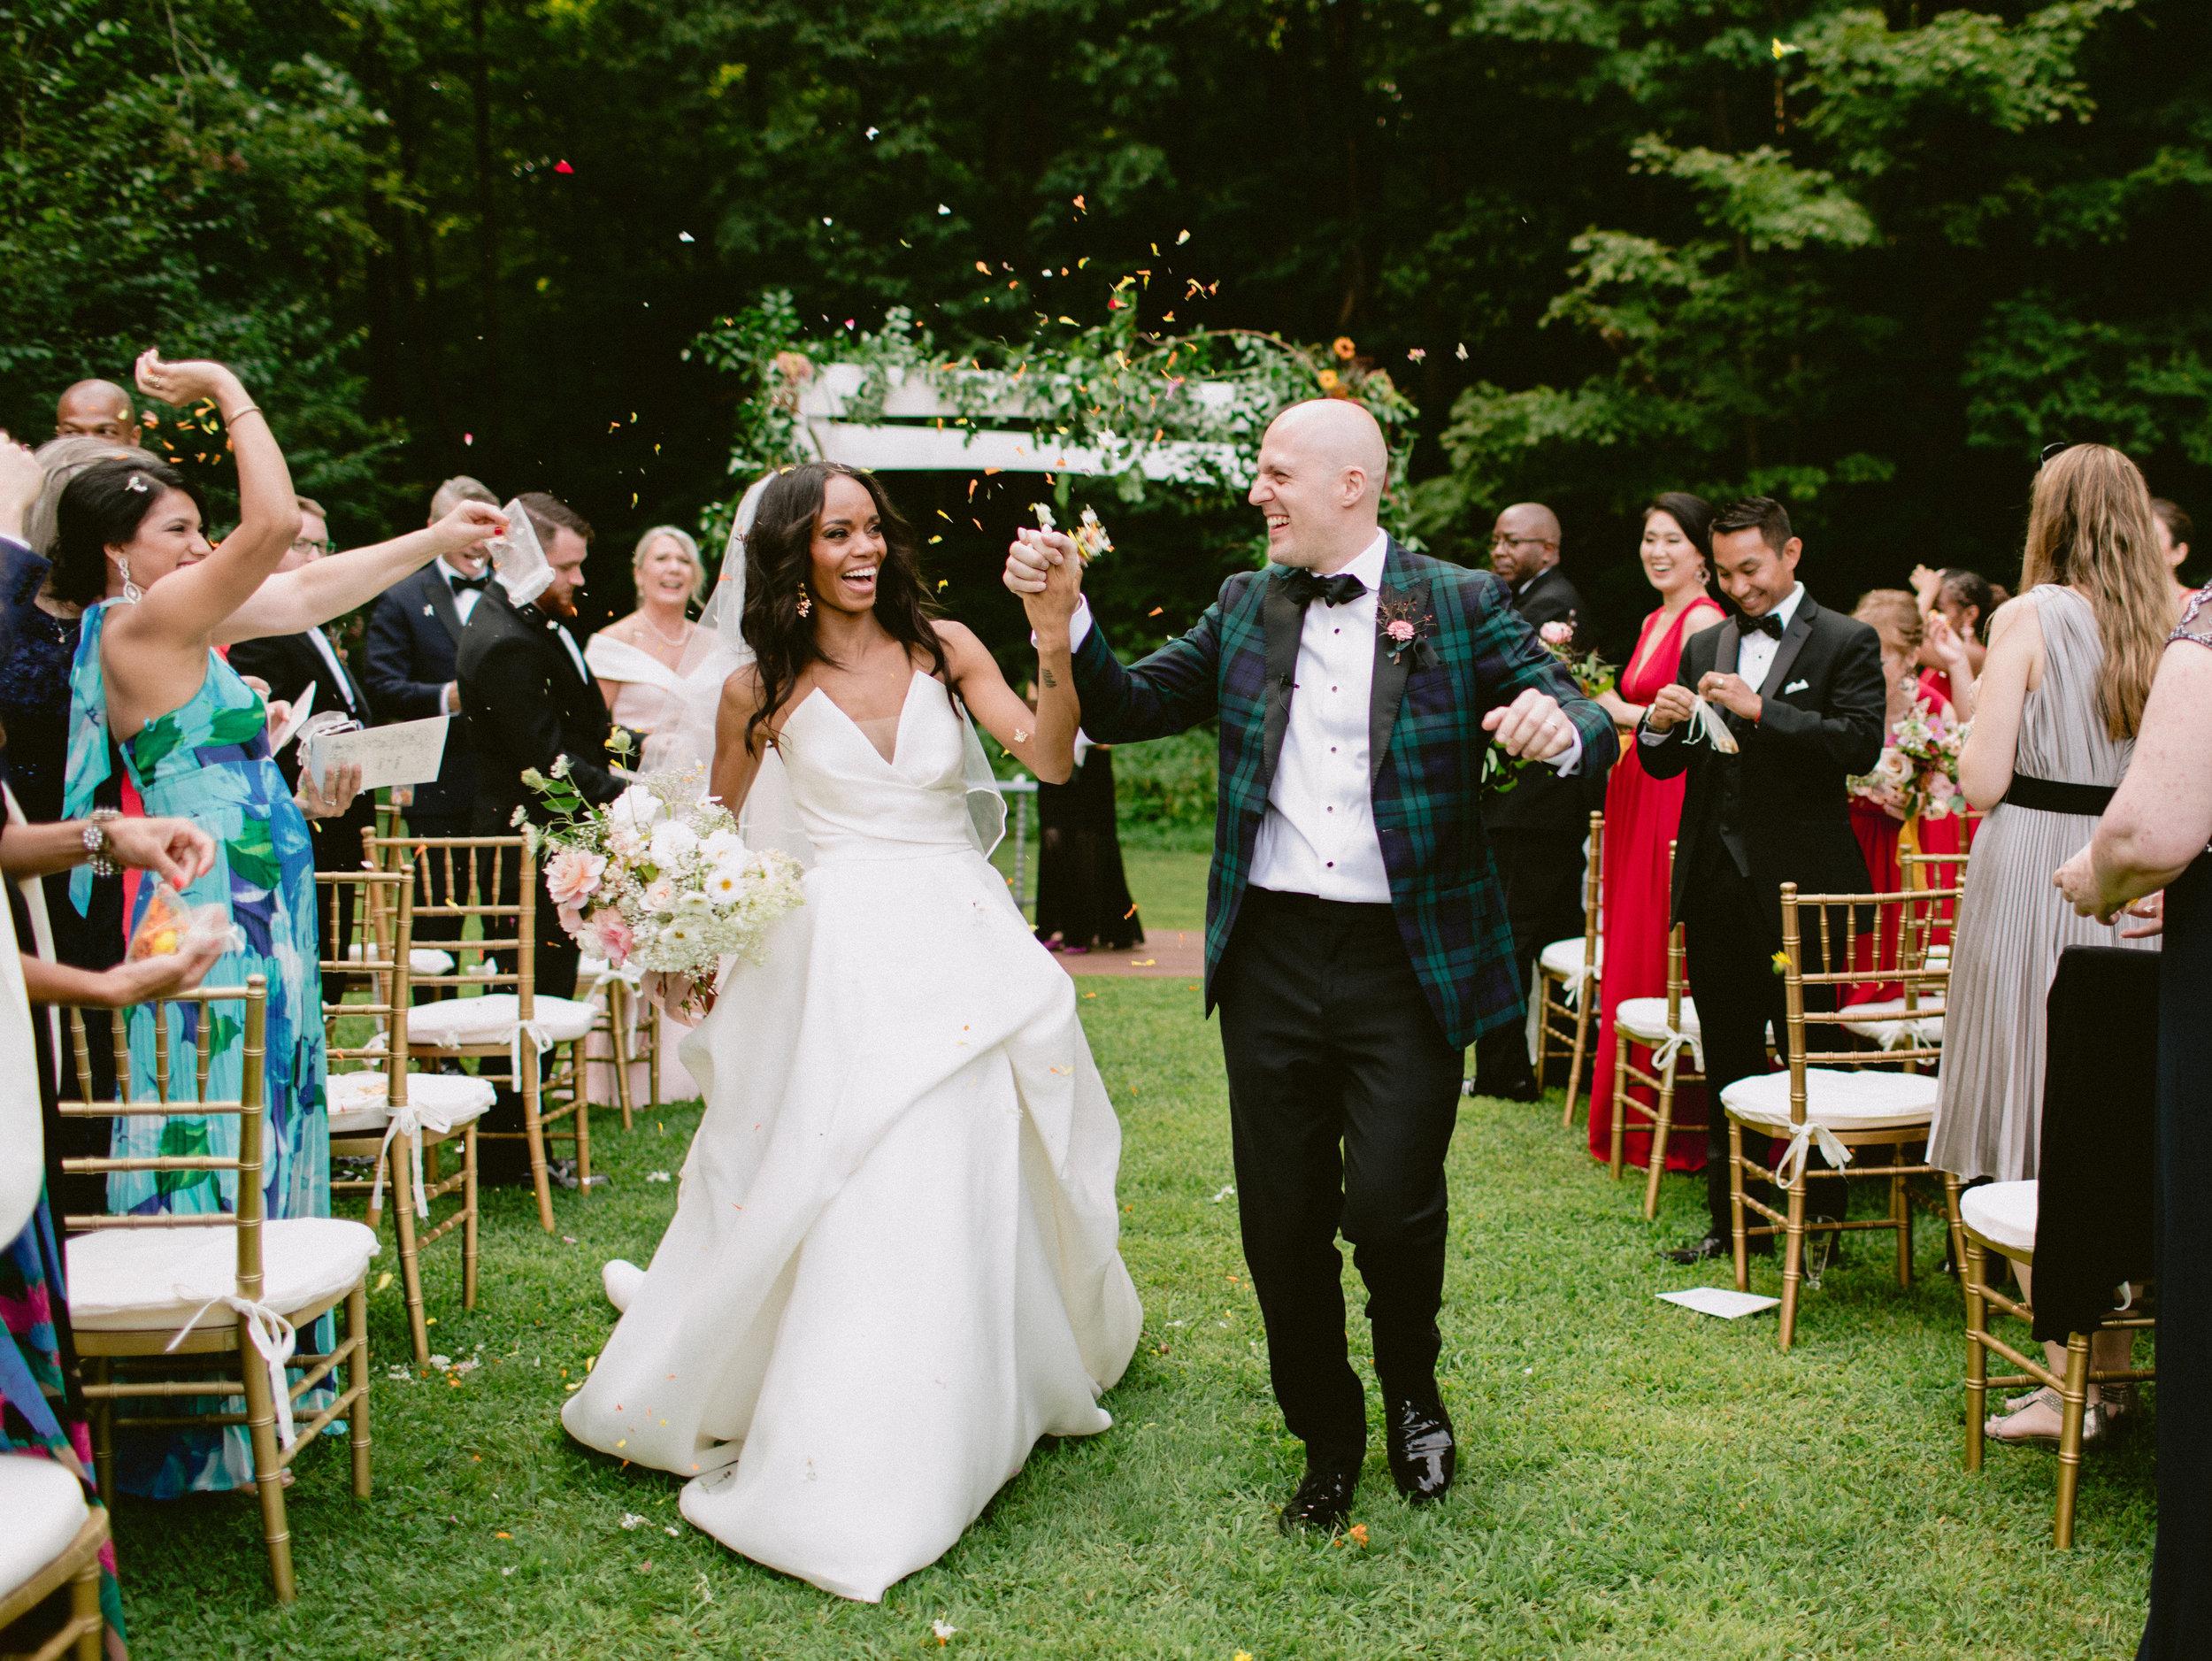 wedding-foxfire-mountain-house-KC24.jpg